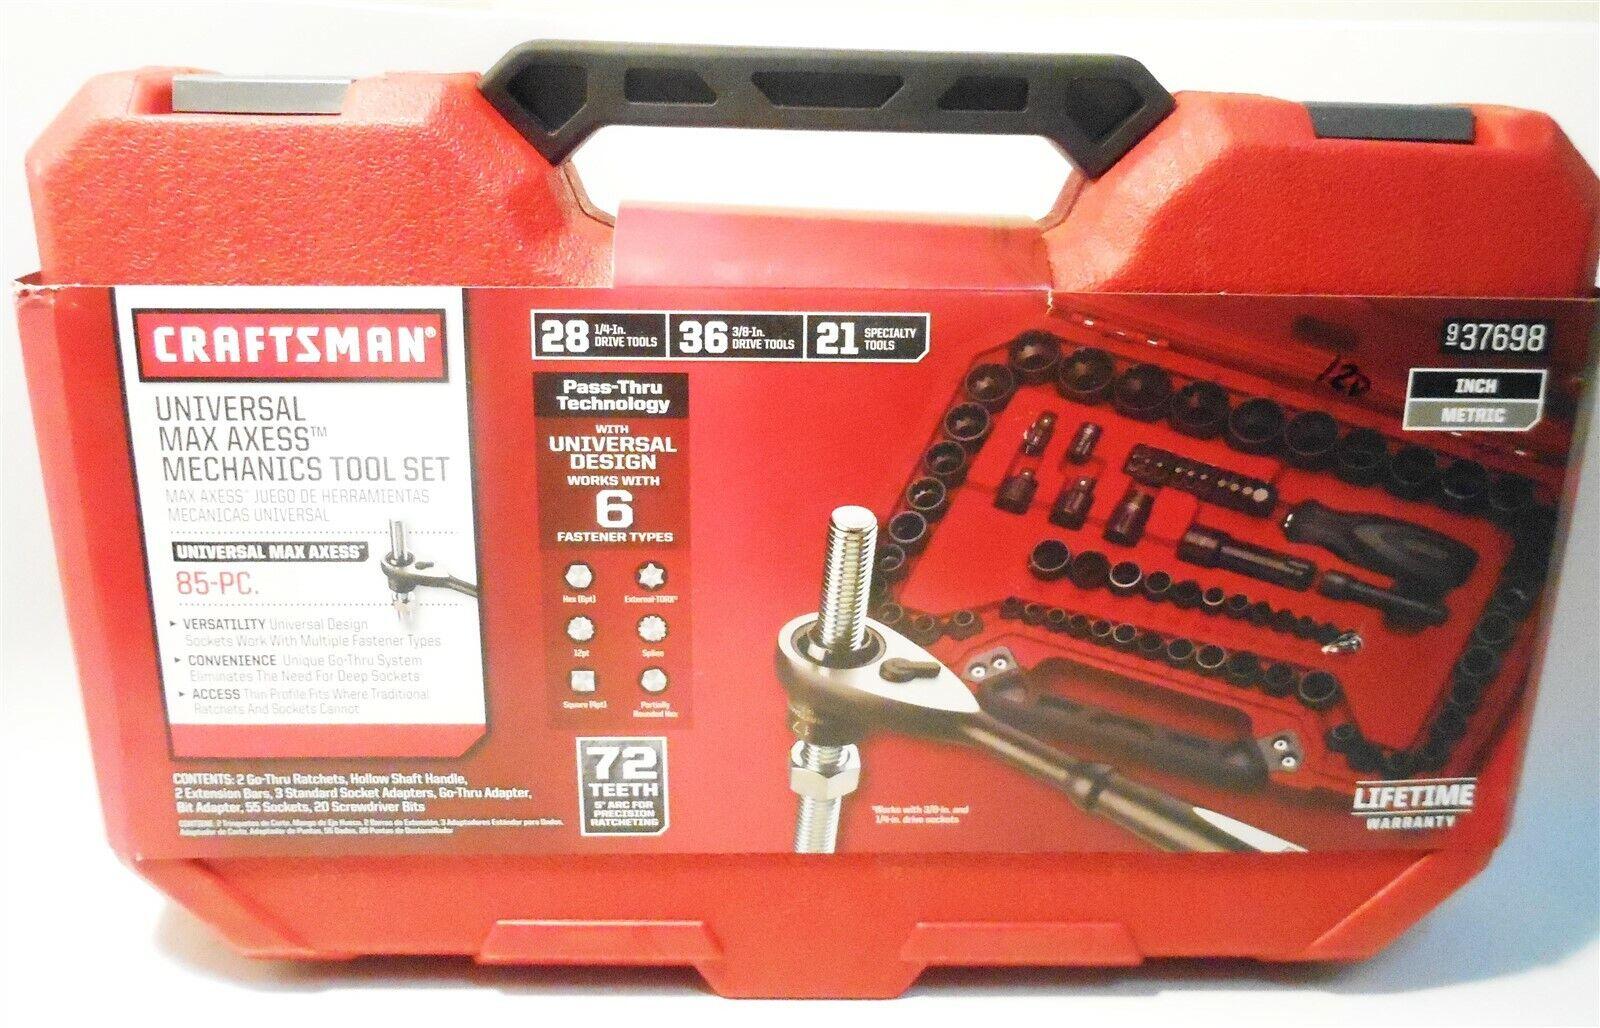 CRAFTSMAN 85-PC Universal MAX AXESS Mechanics Tool Set